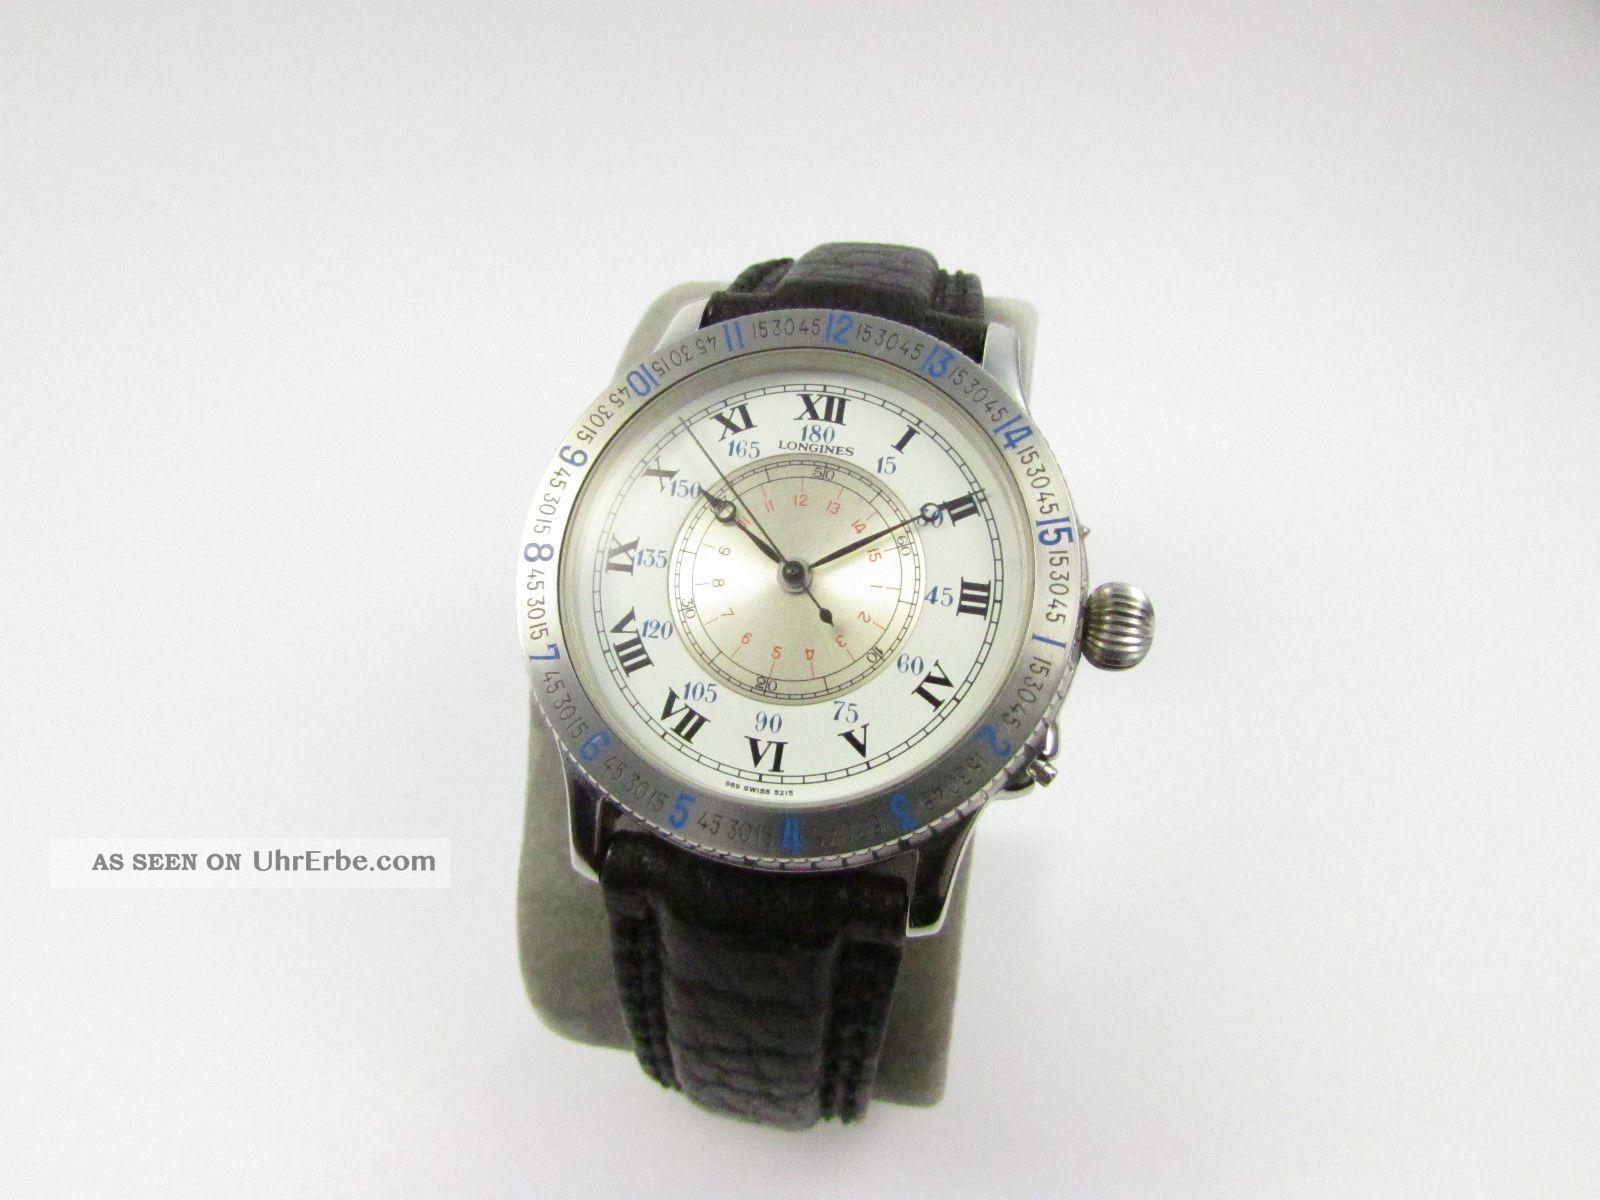 Longines Charles Lindbergh Stundenwinkel Hour Angel - Automatik - Navigationsuhr Armbanduhren Bild